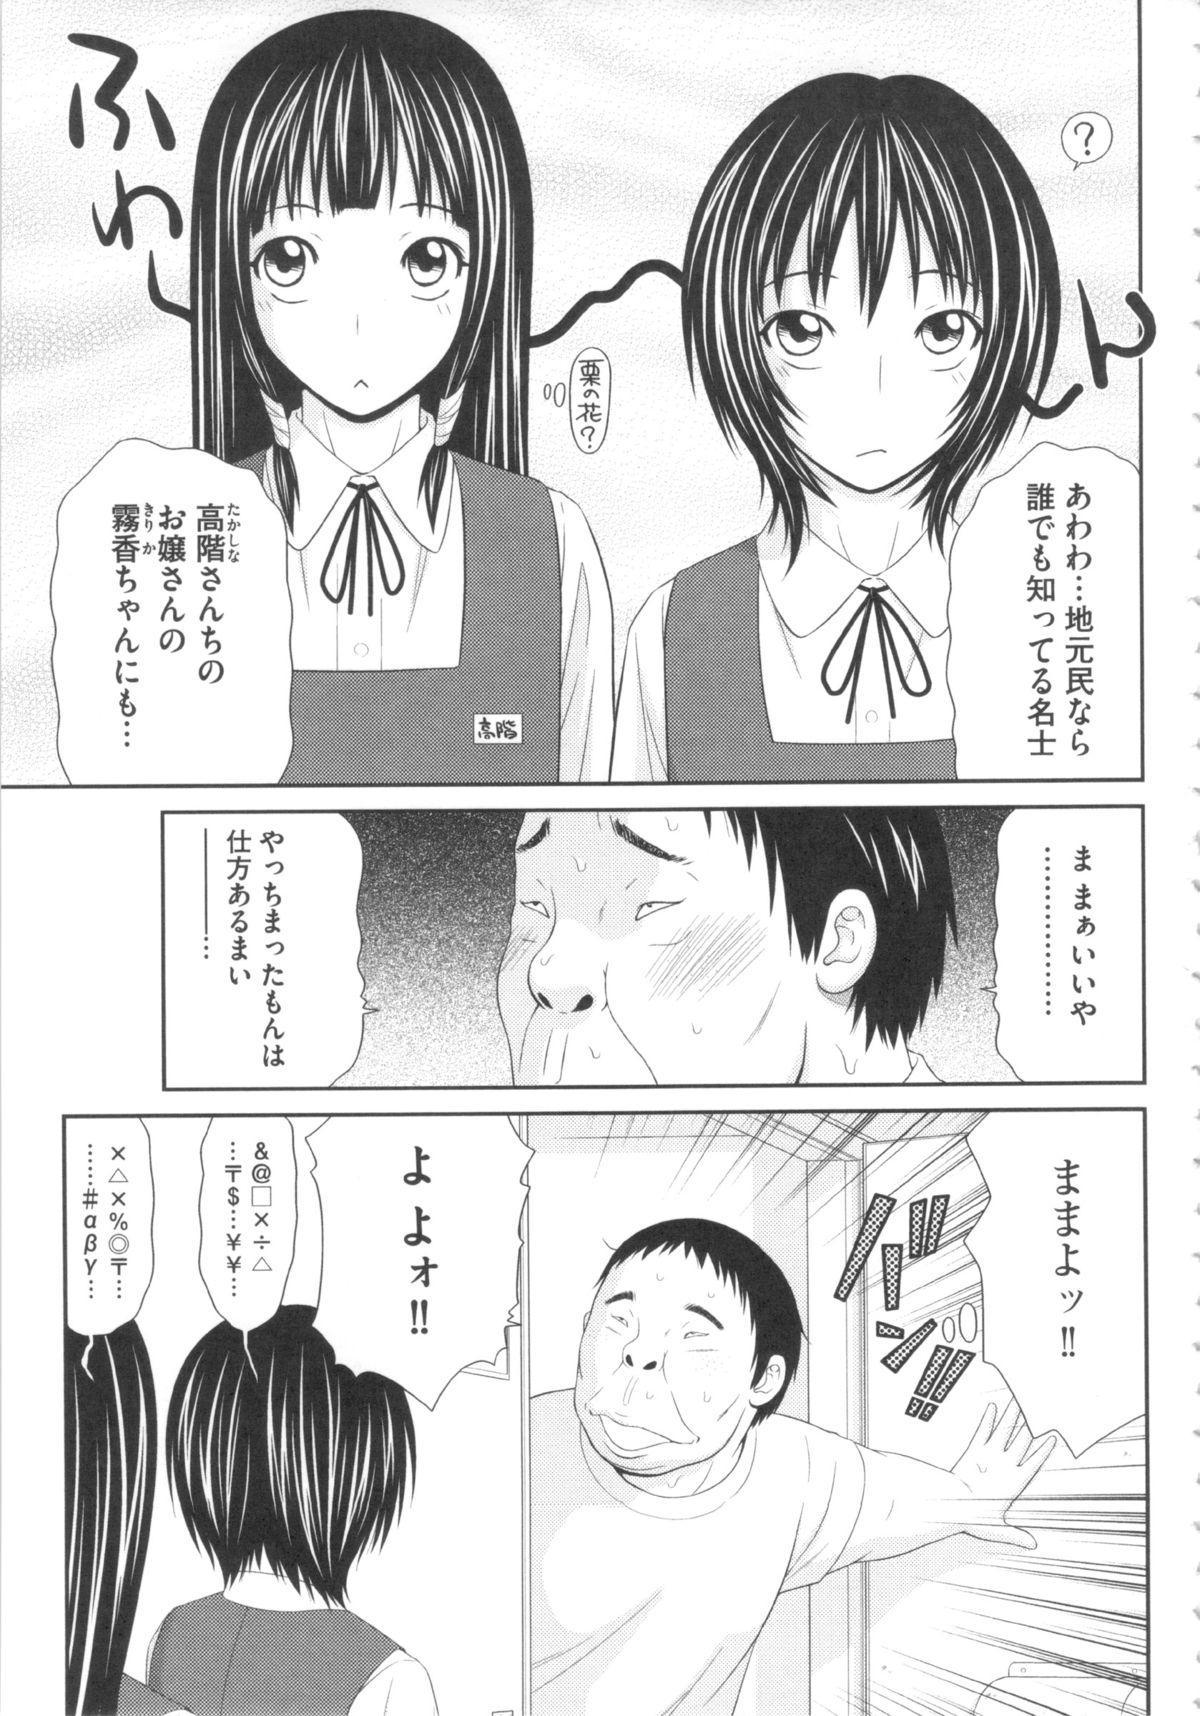 Kiseki No Zaajiru - Sperm of Miracle 27